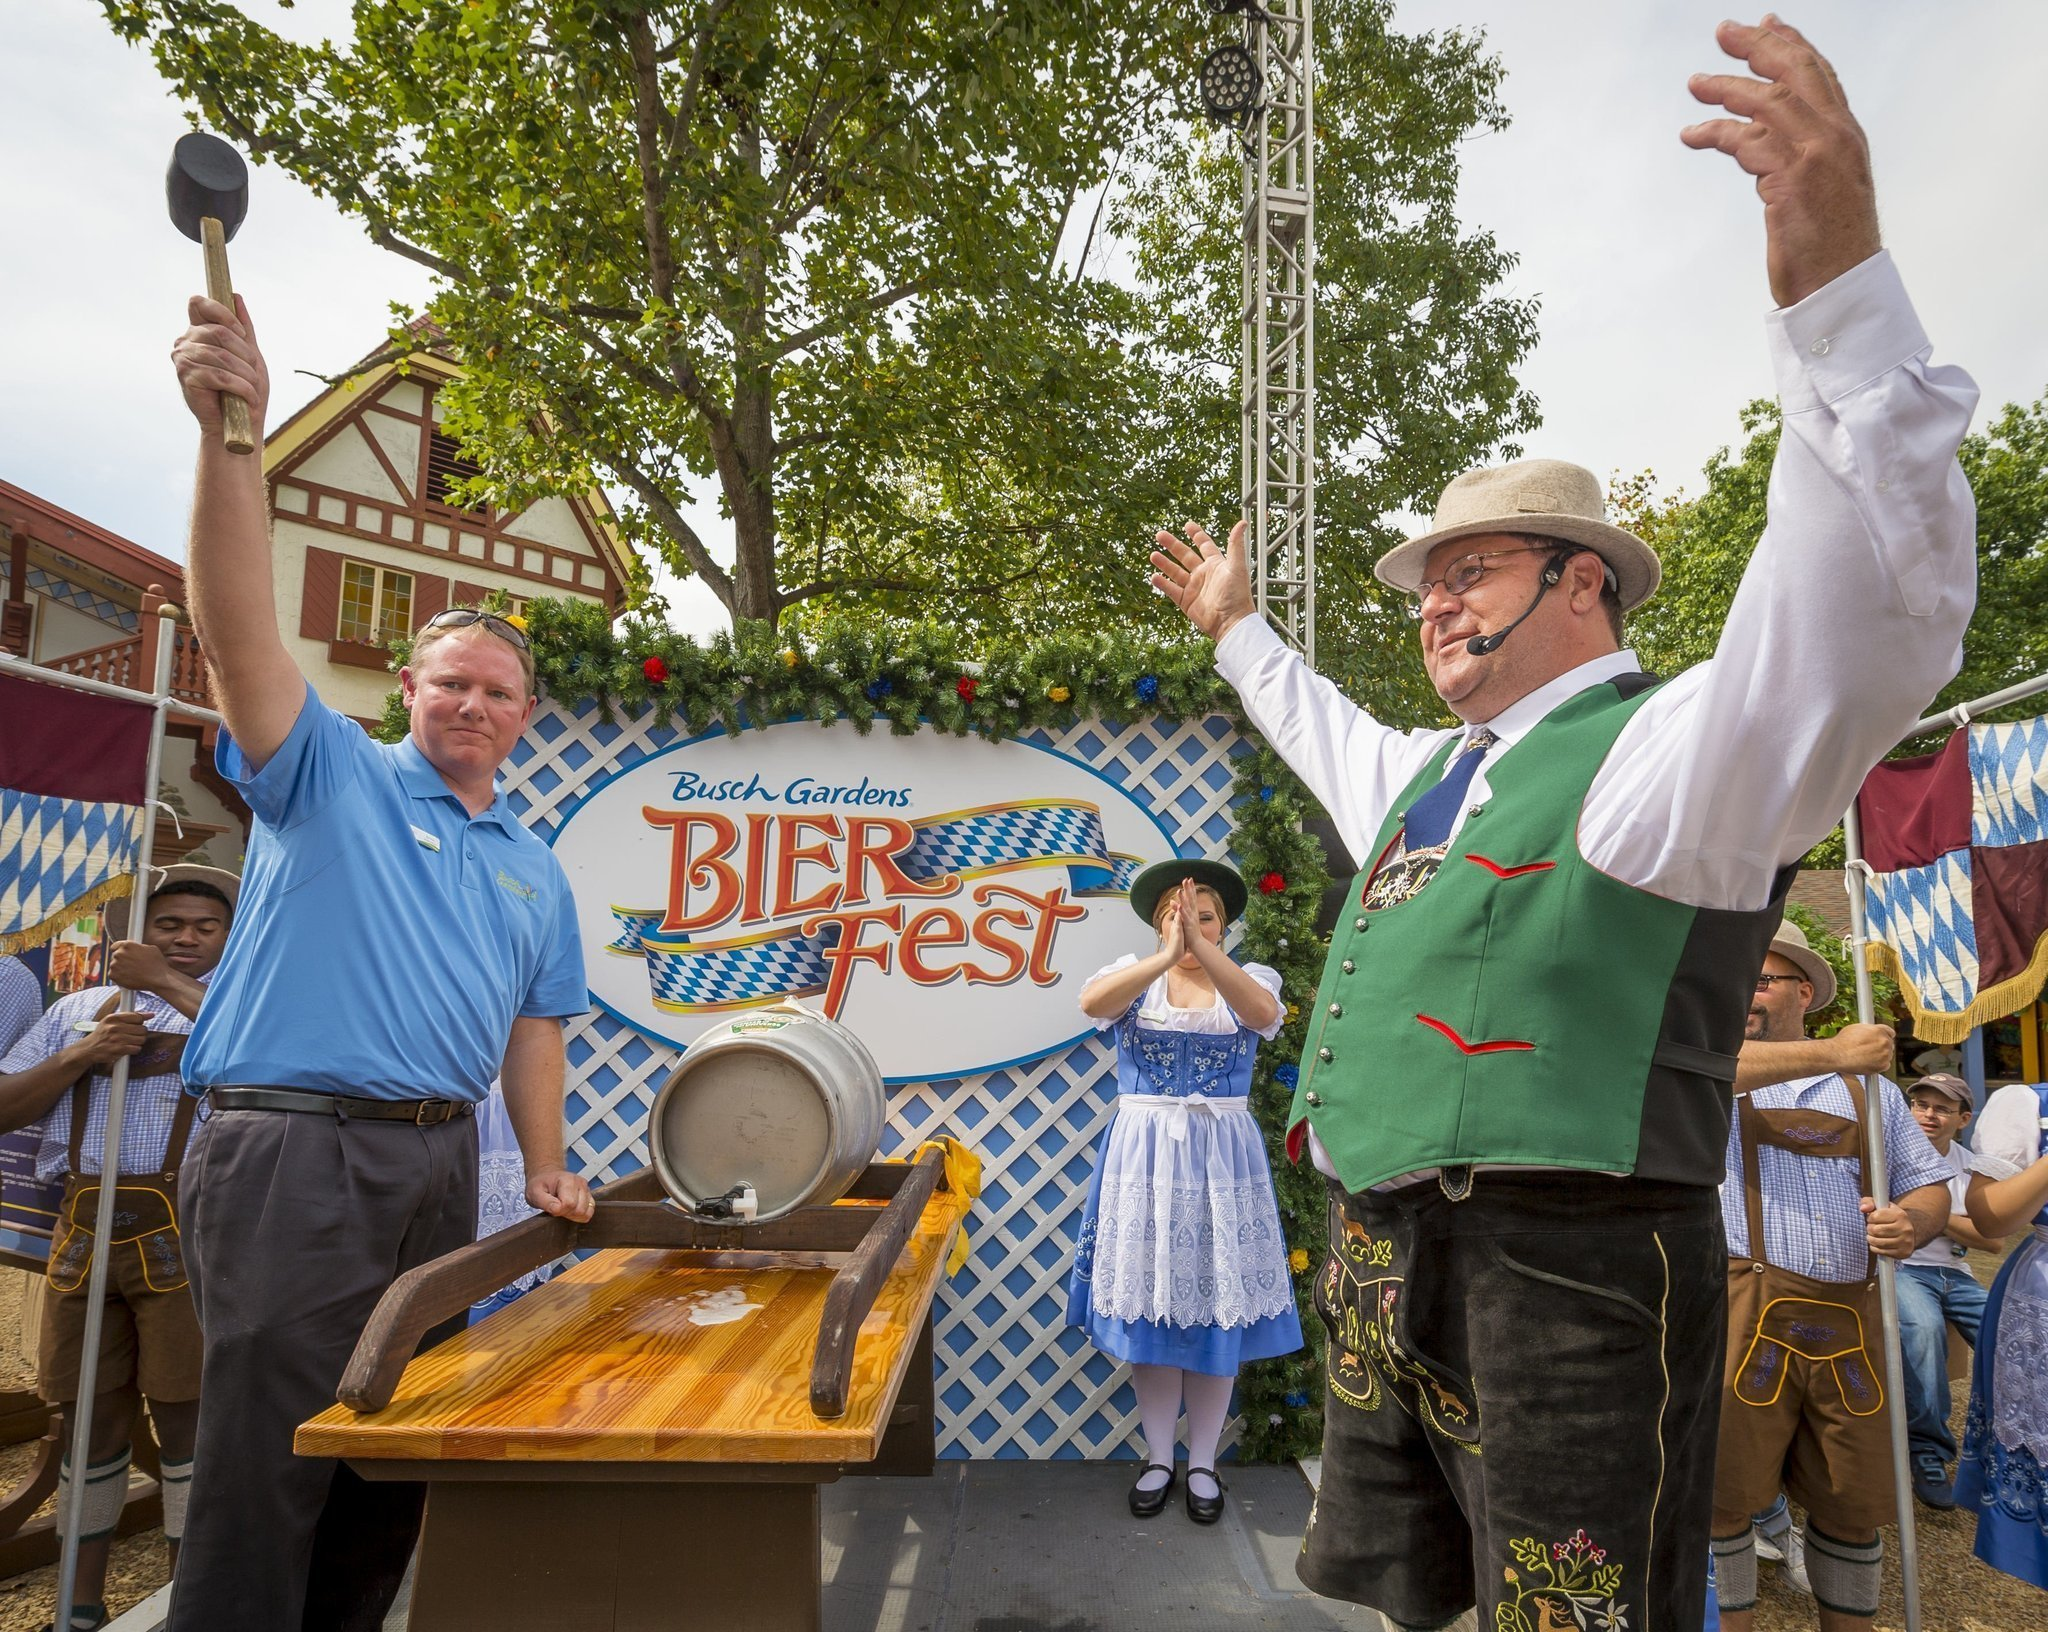 Image Result For Busch Gardens Beer Festival